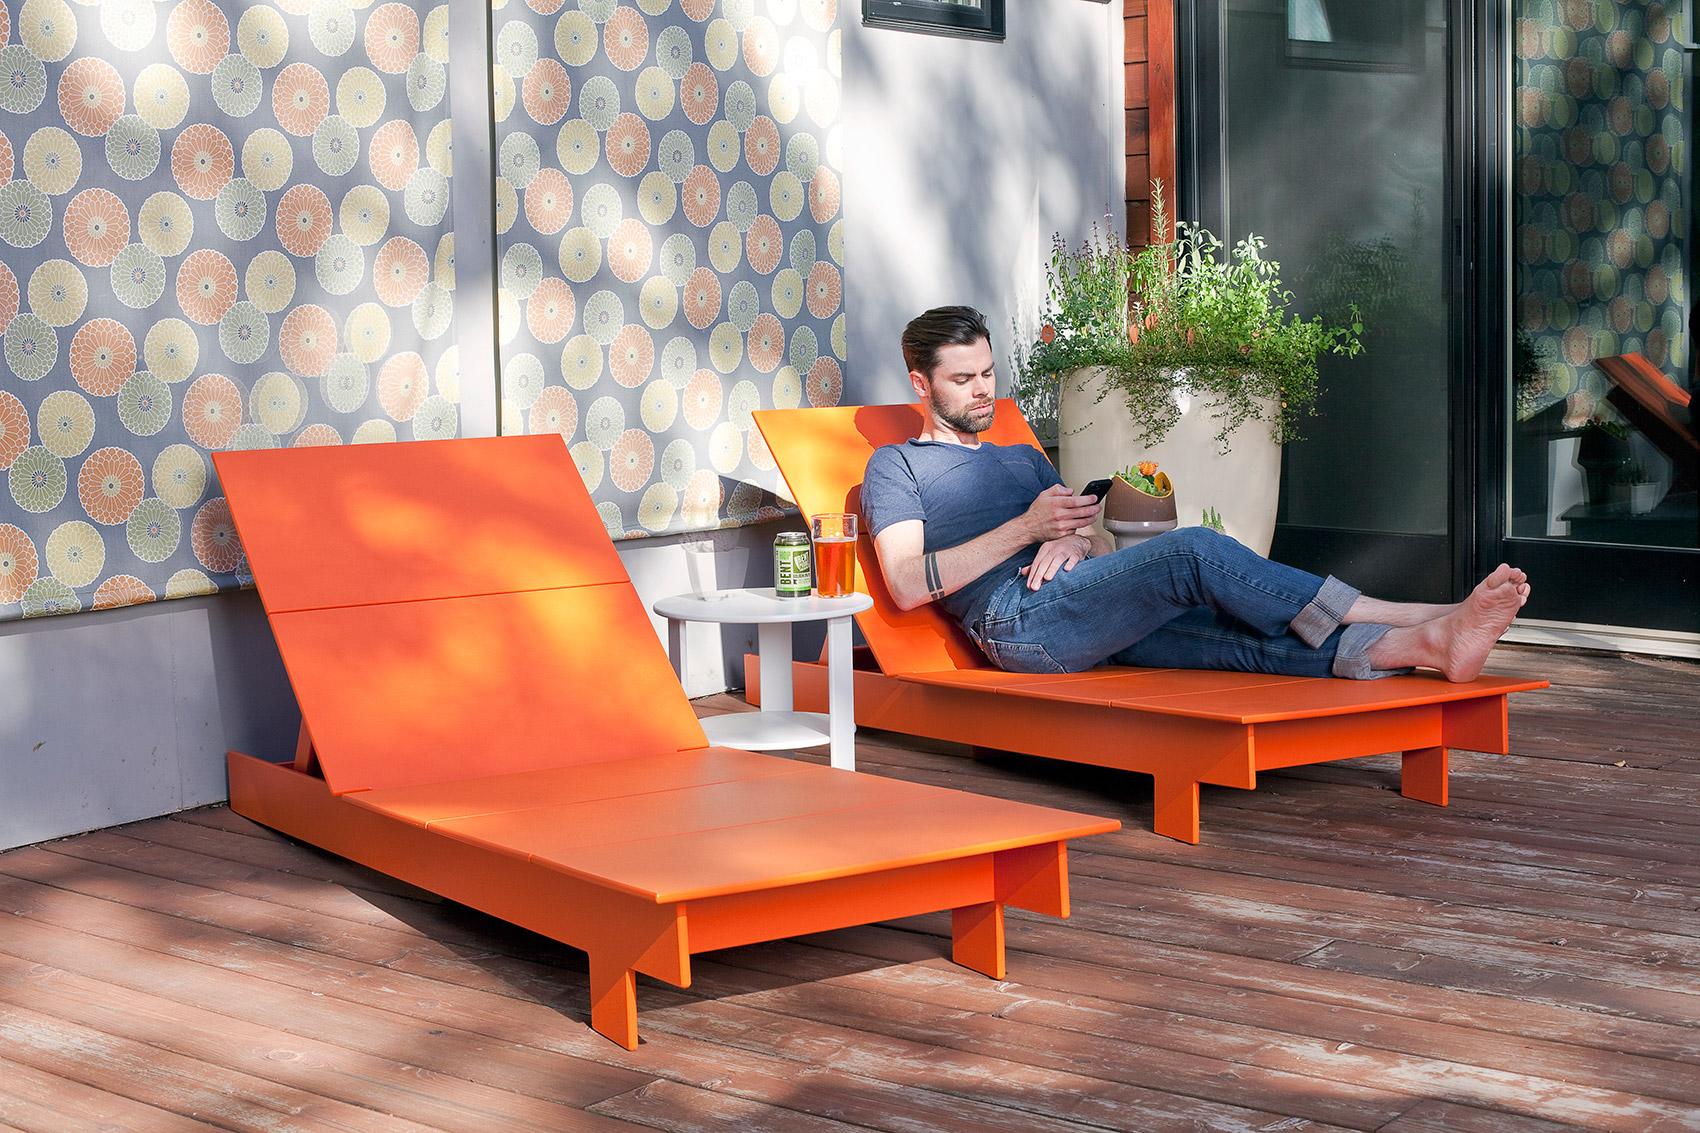 lollygagger-chaise-sunbed-patio.jpg